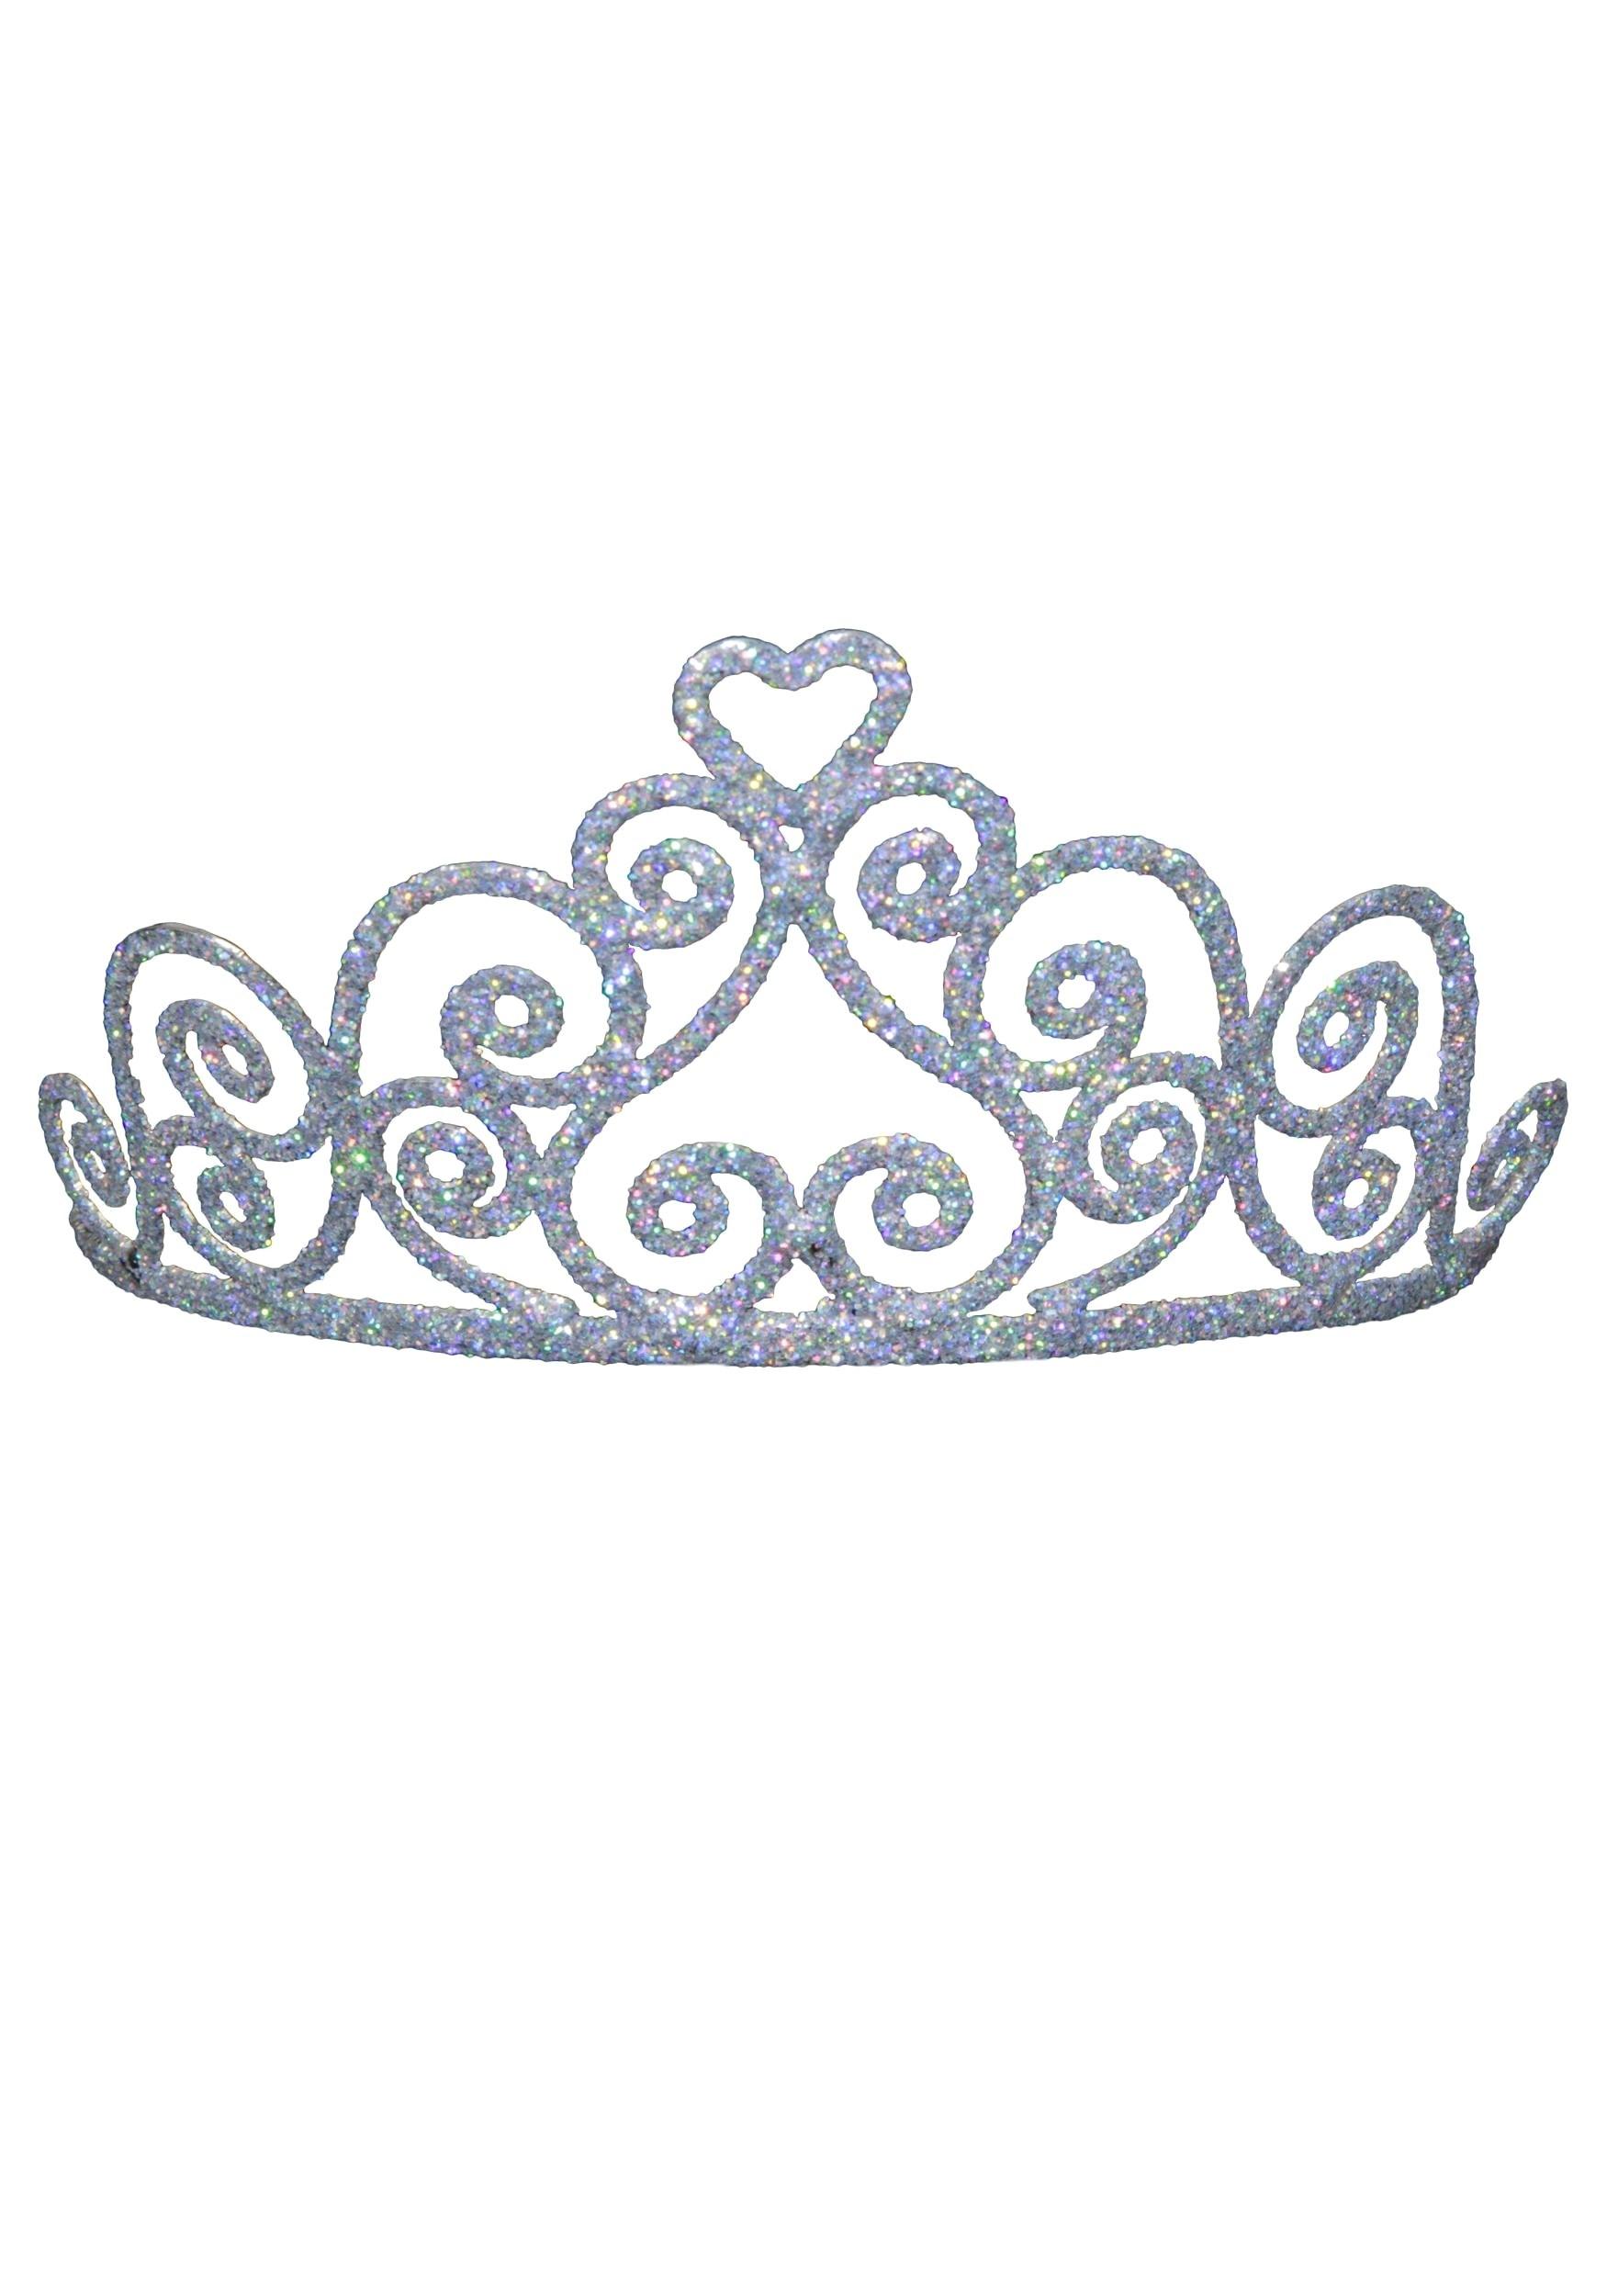 Quinceanera crown clipart 1 » Clipart Portal.